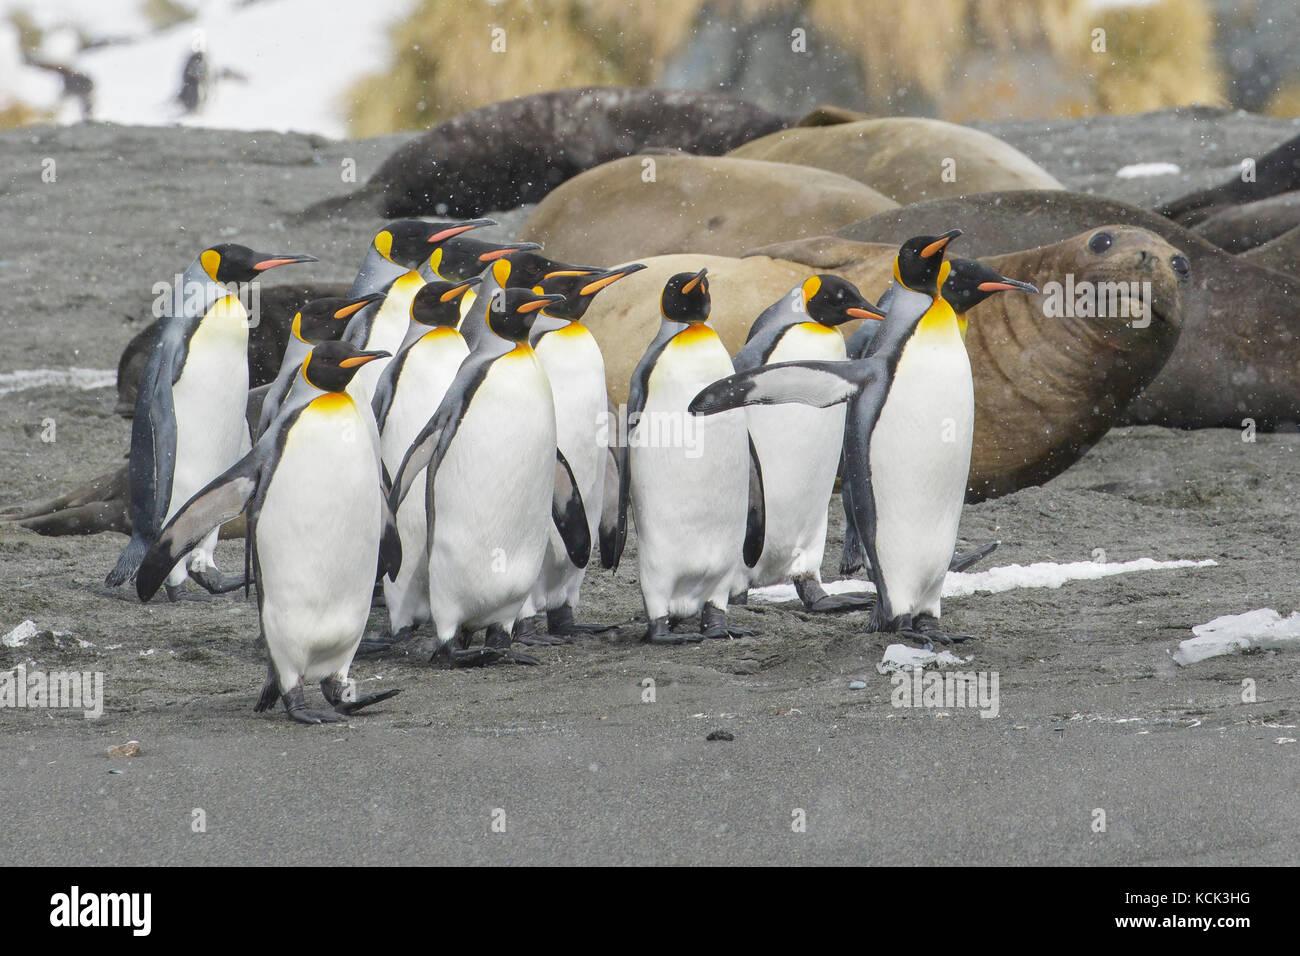 Pingüino Rey aptenodytes patagonicus, con grandes elefantes marinos mirounga angustirostris, en la parte trasera Imagen De Stock